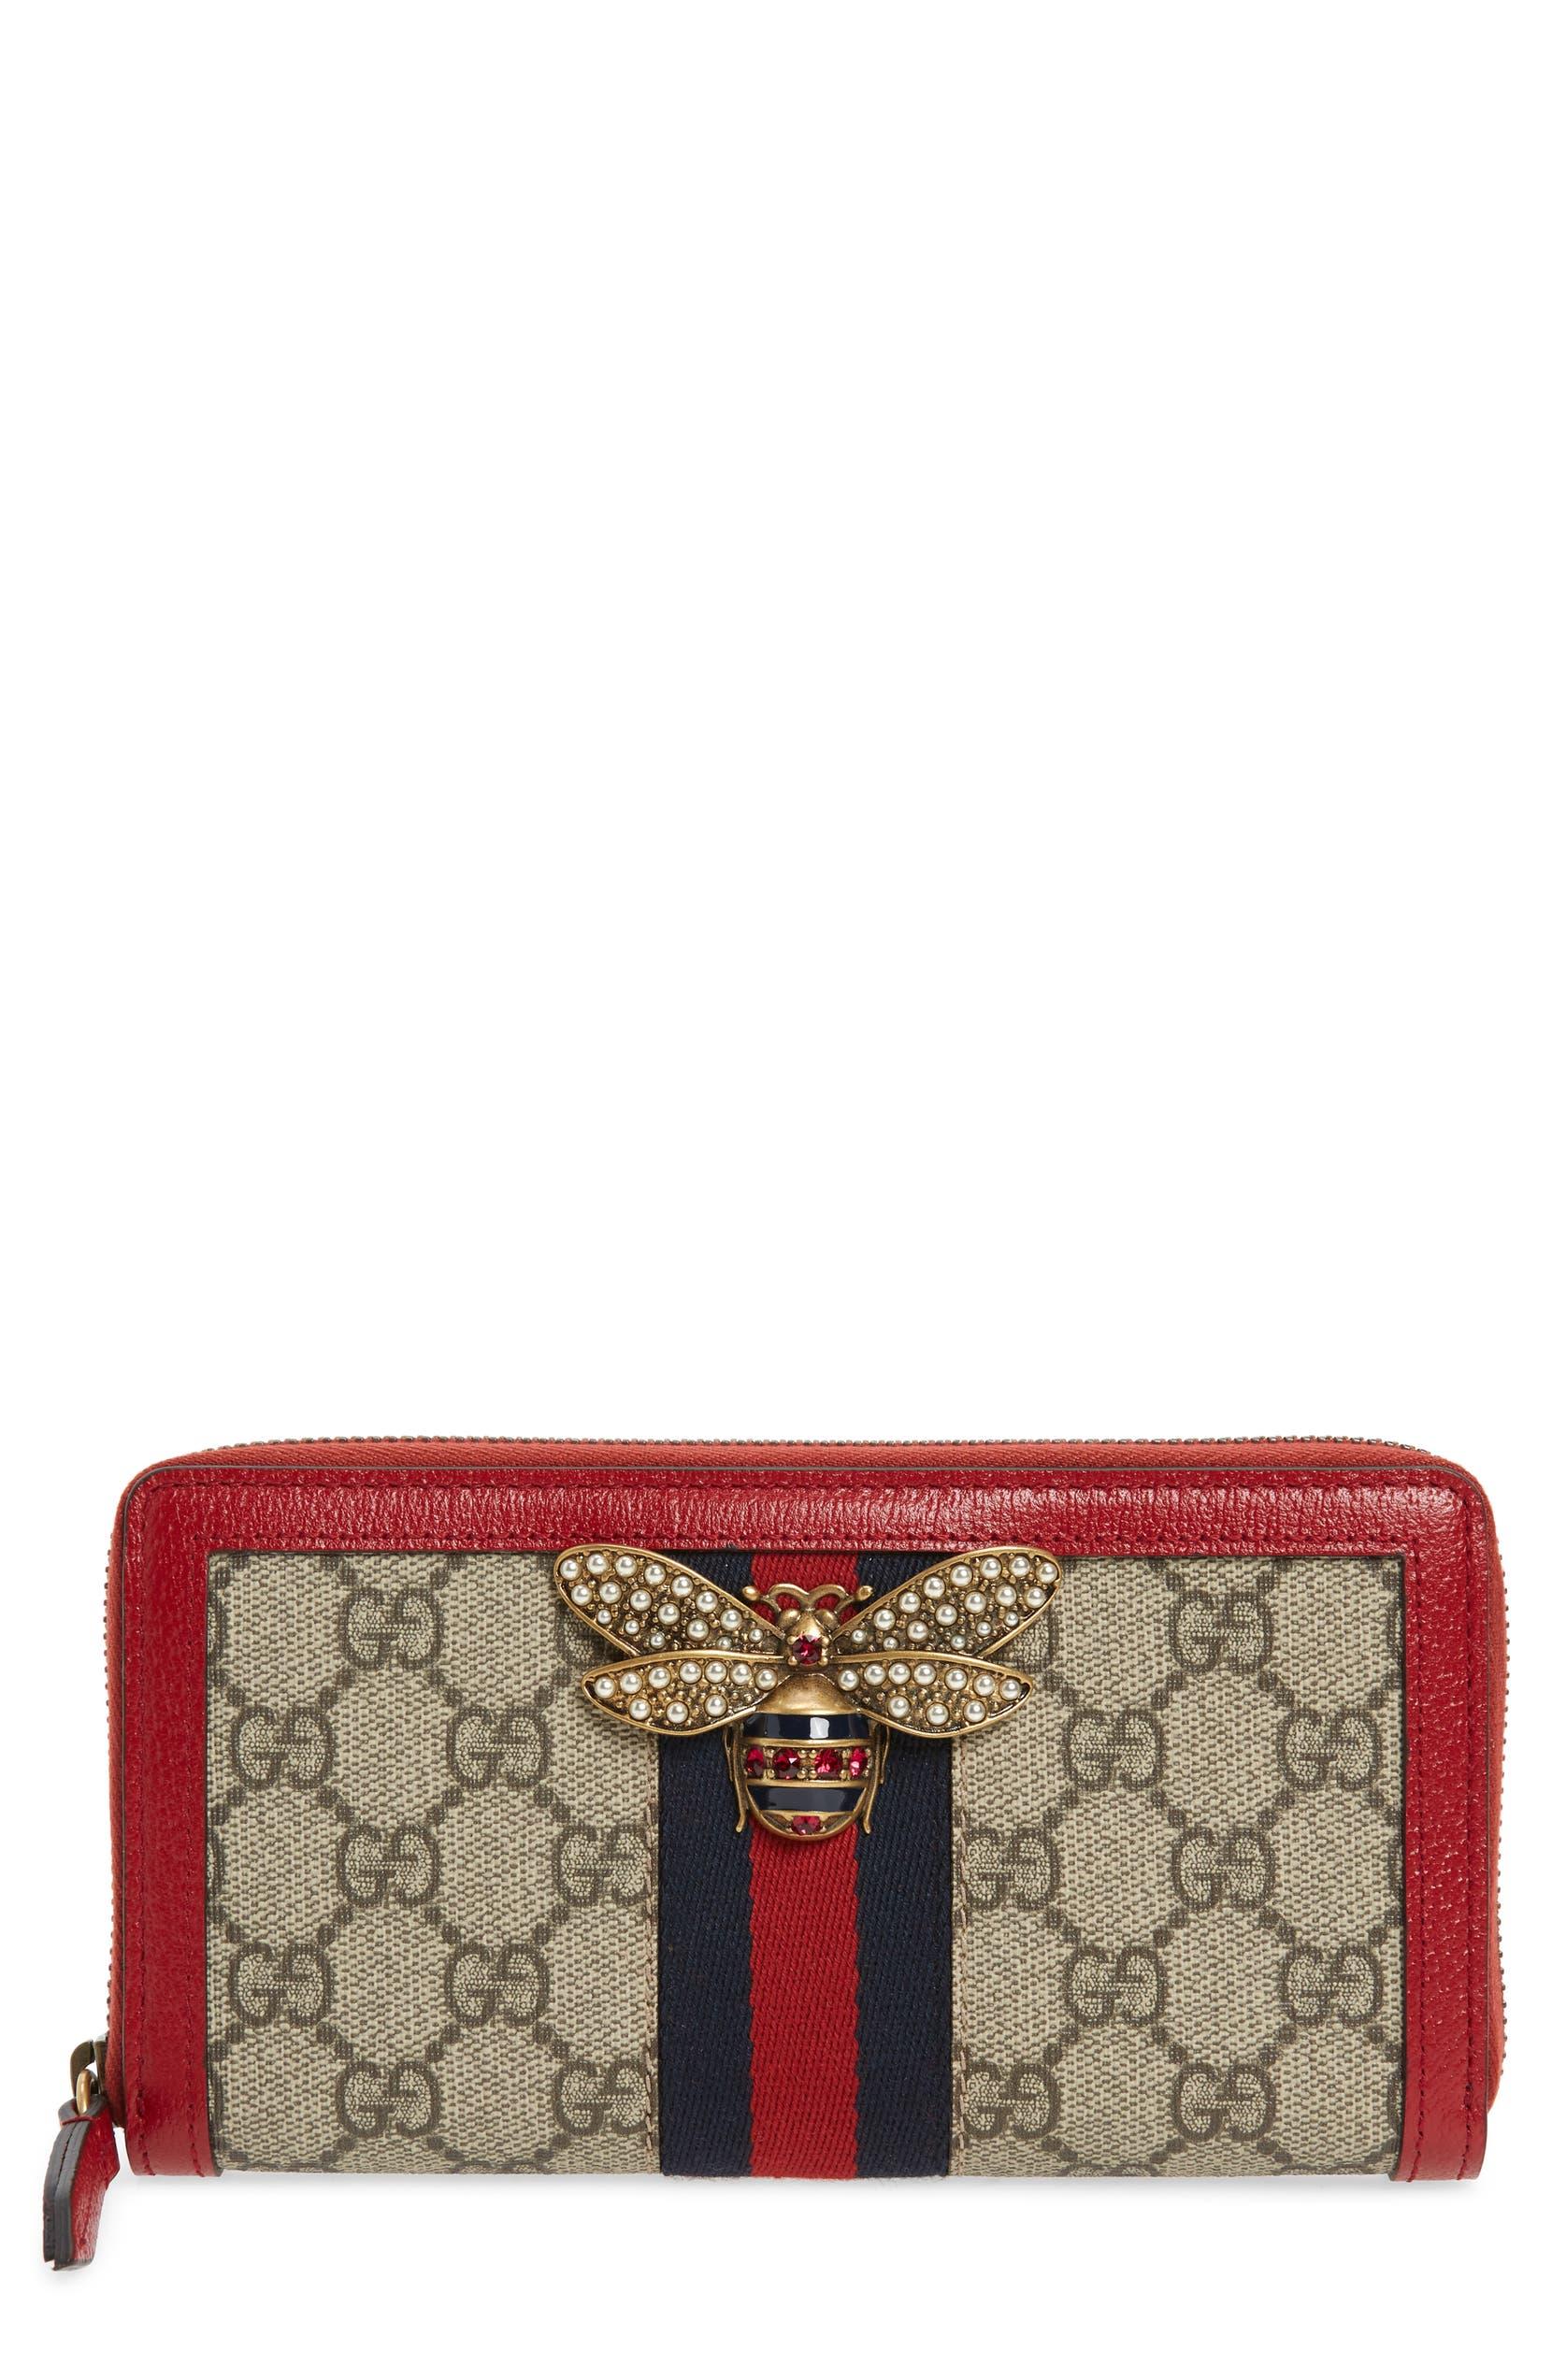 07026061e84548 Gucci Queen Margaret GG Supreme Canvas Wallet | Nordstrom